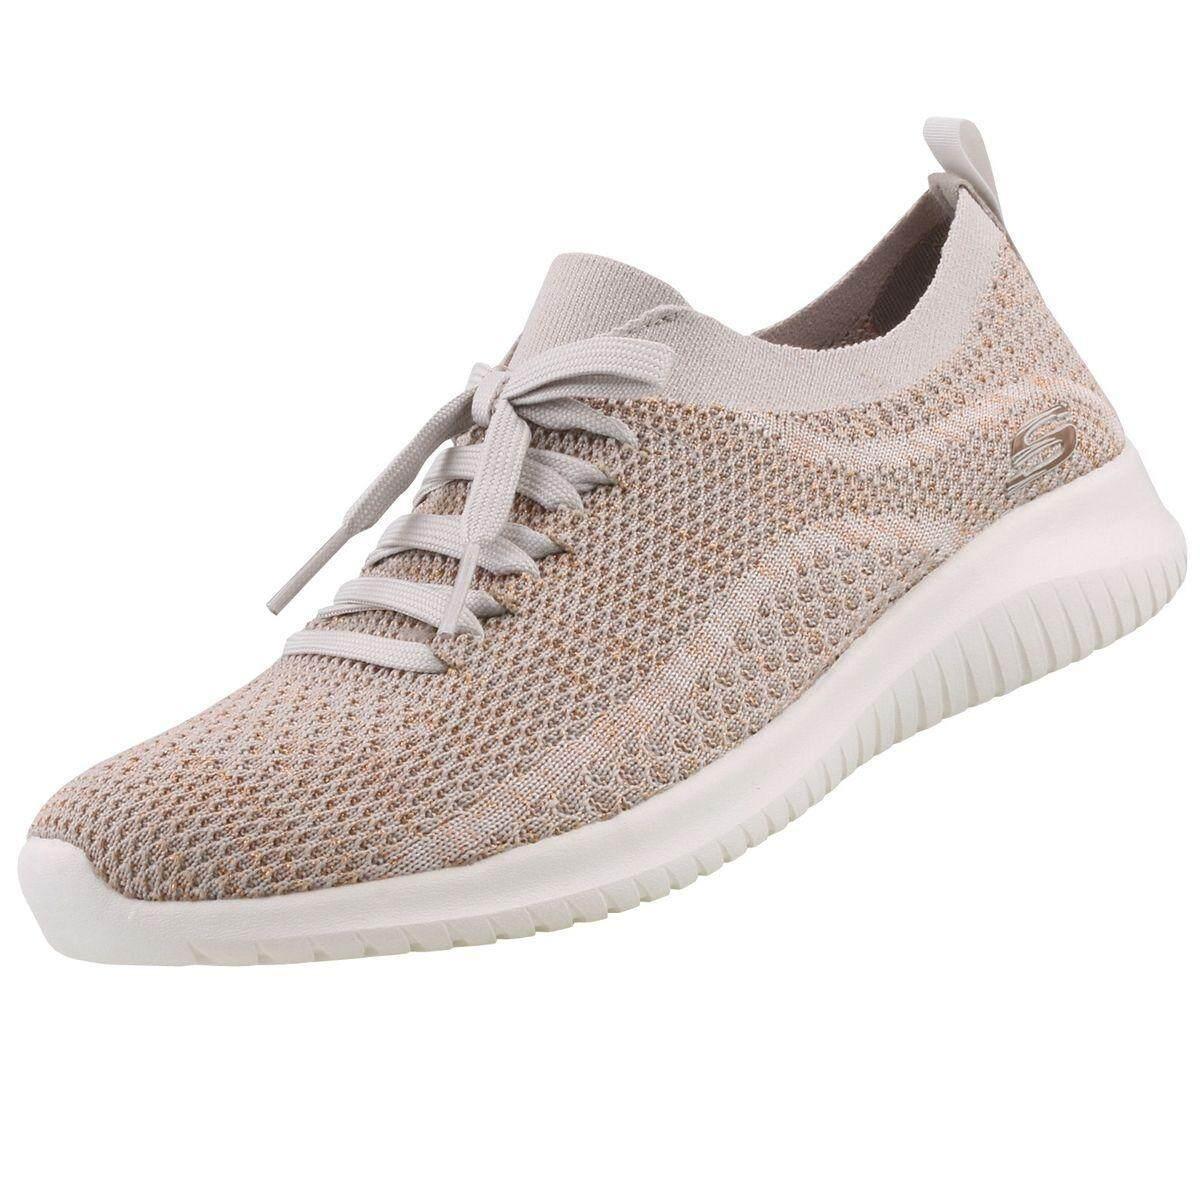 SKECHERS WOMEN รองเท้าผ้าใบ ผู้หญิง รุ่น ULTRA FLEX - 12843TPGD (TAUPE/GOLD)